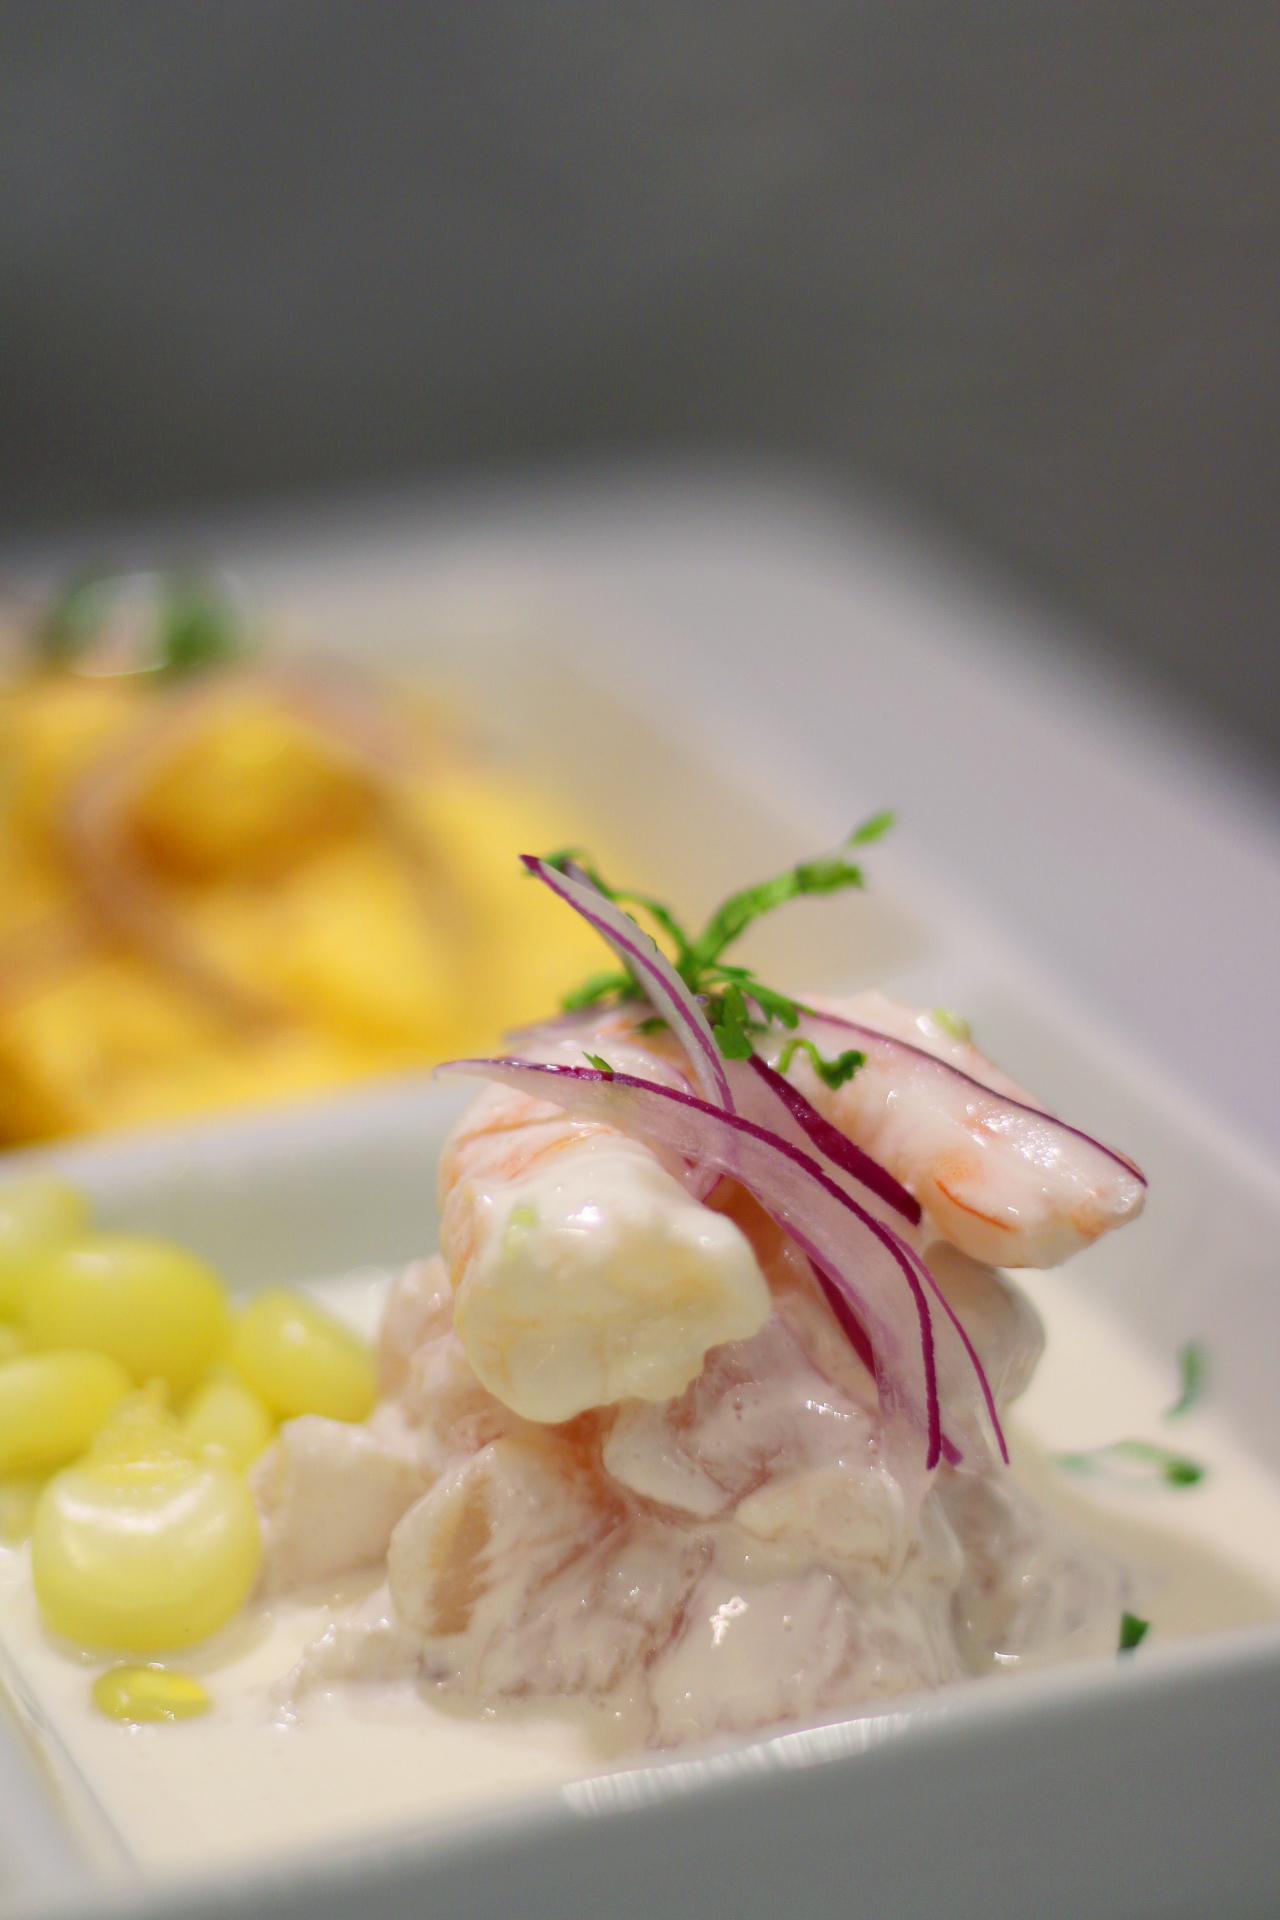 Mikuna is the best Peruvian restaurant in Coral Gables.